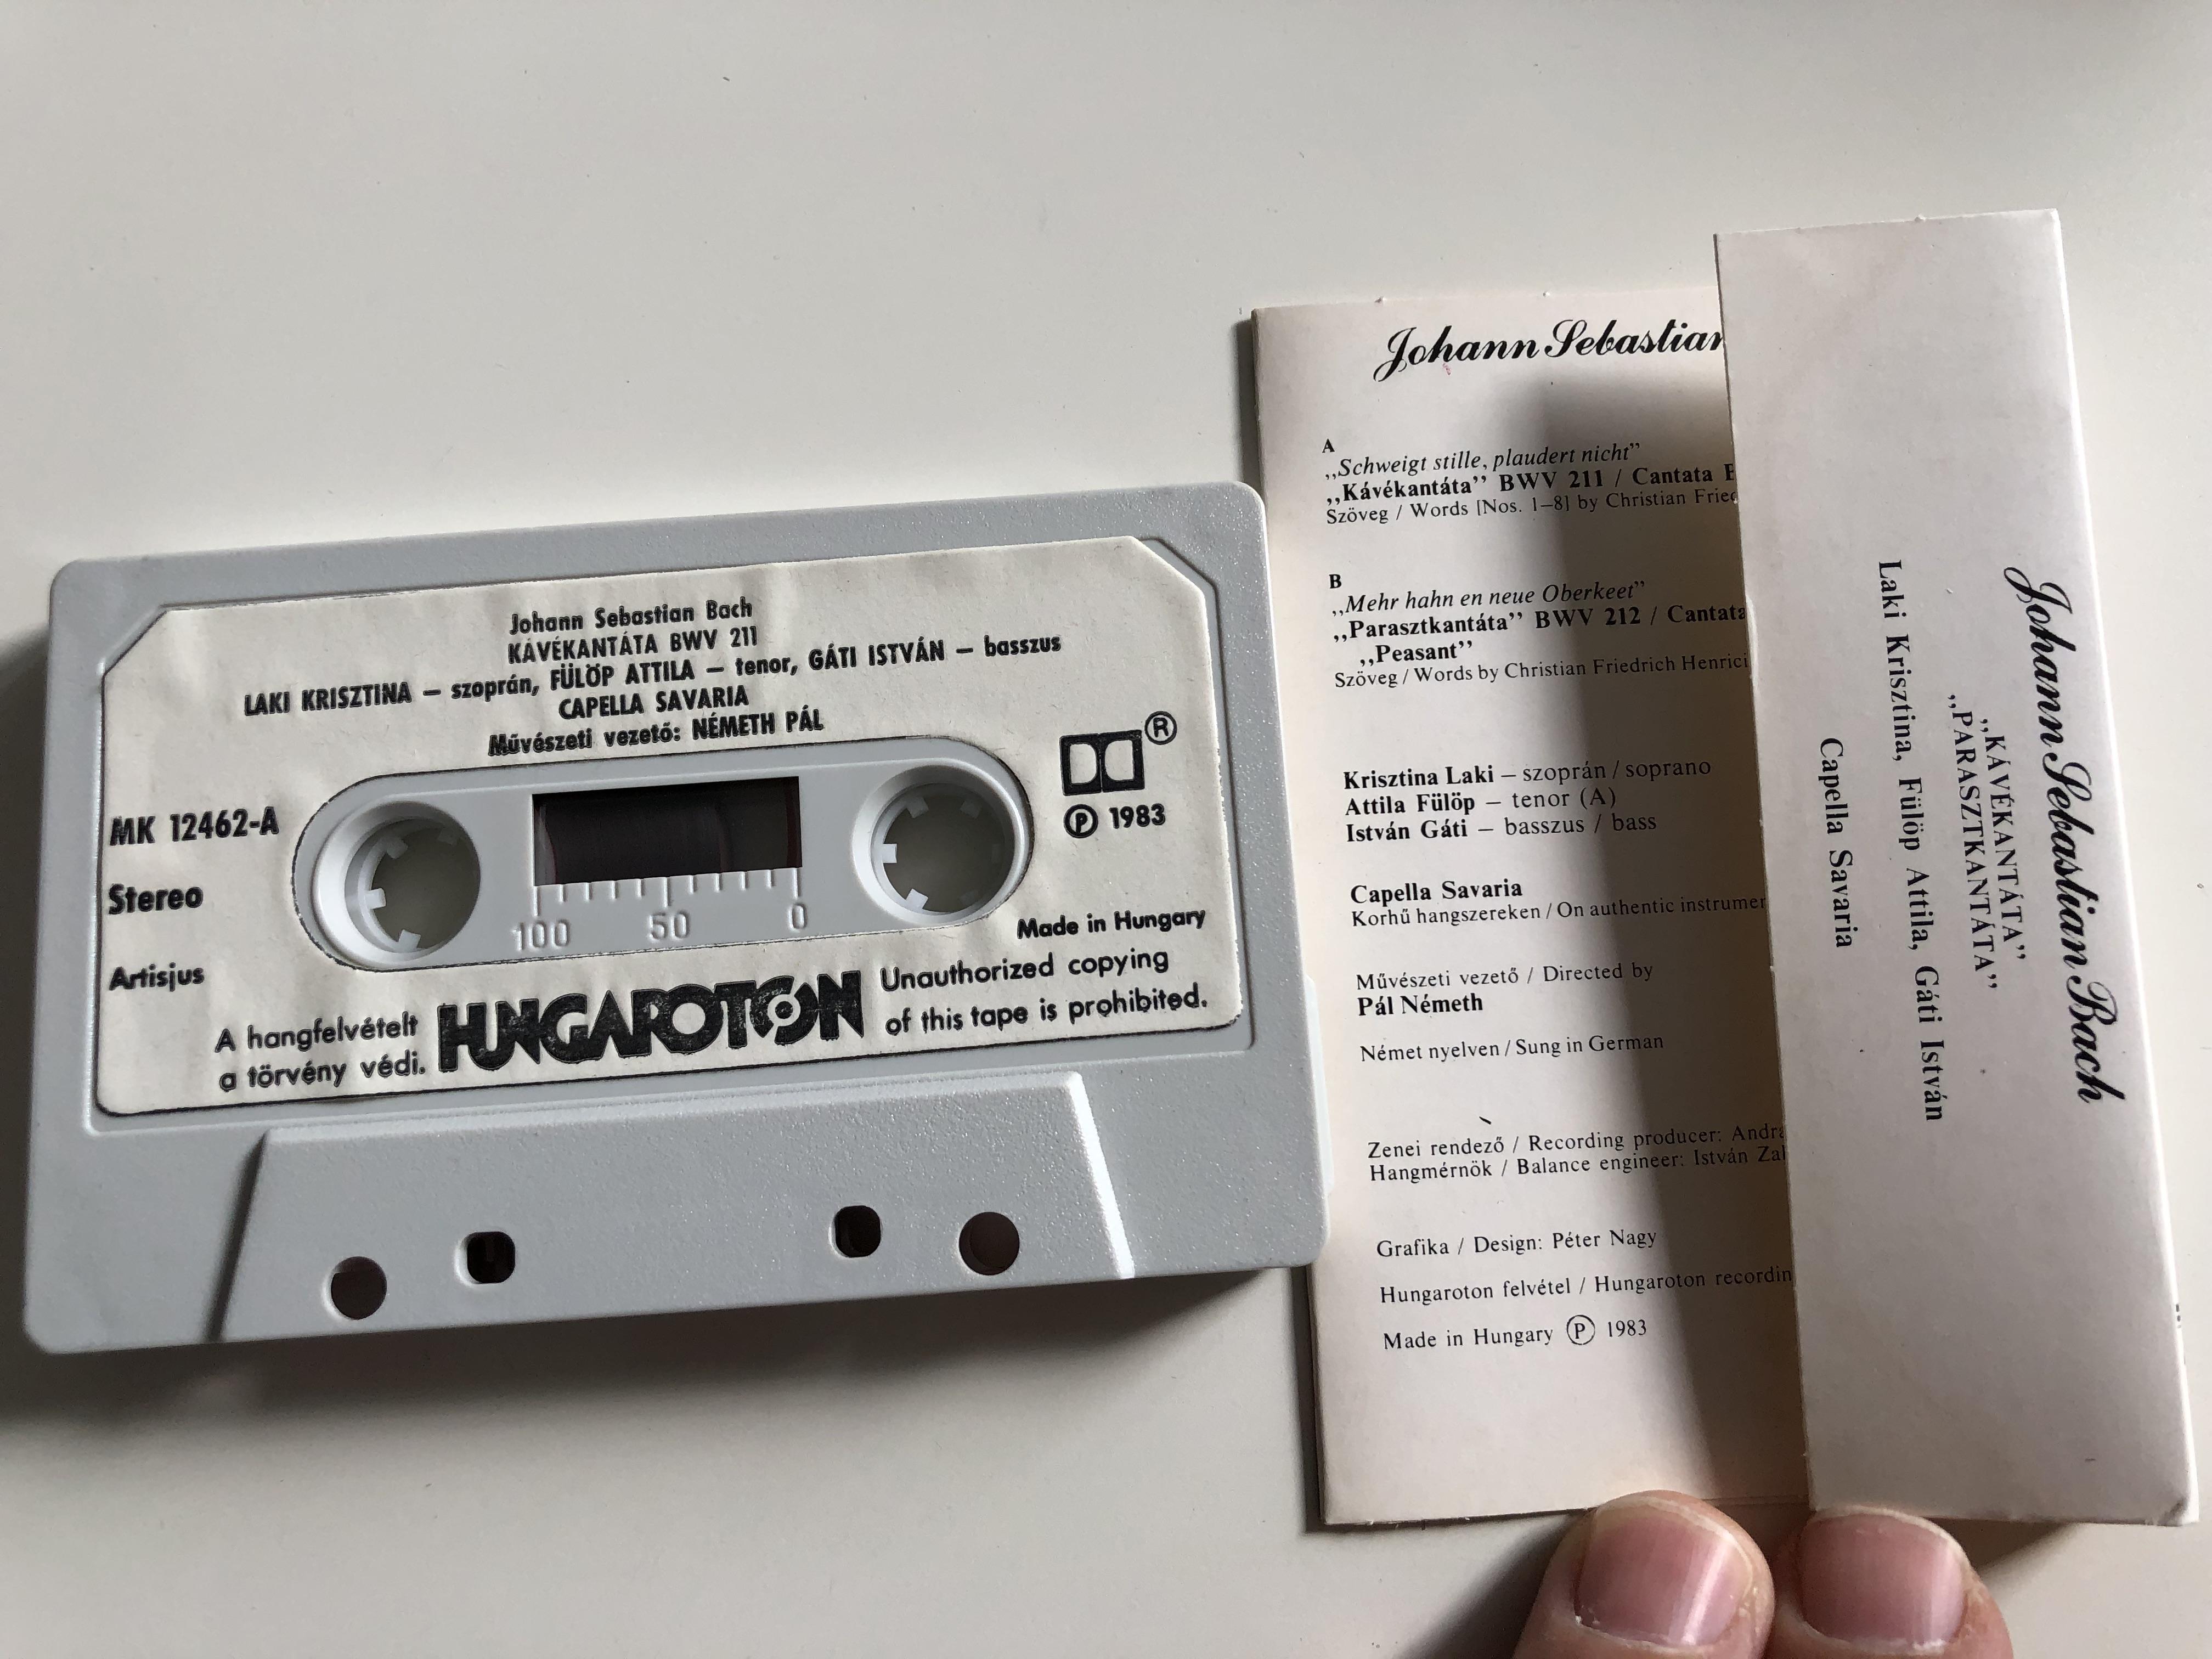 johann-sebastian-bach-cantatas-coffe-peasant-krisztina-laki-istv-n-g-ti-attila-f-l-p-directed-p-l-n-meth-capella-savaria-hungaroton-cassette-stereo-mk-12462-2-.jpg